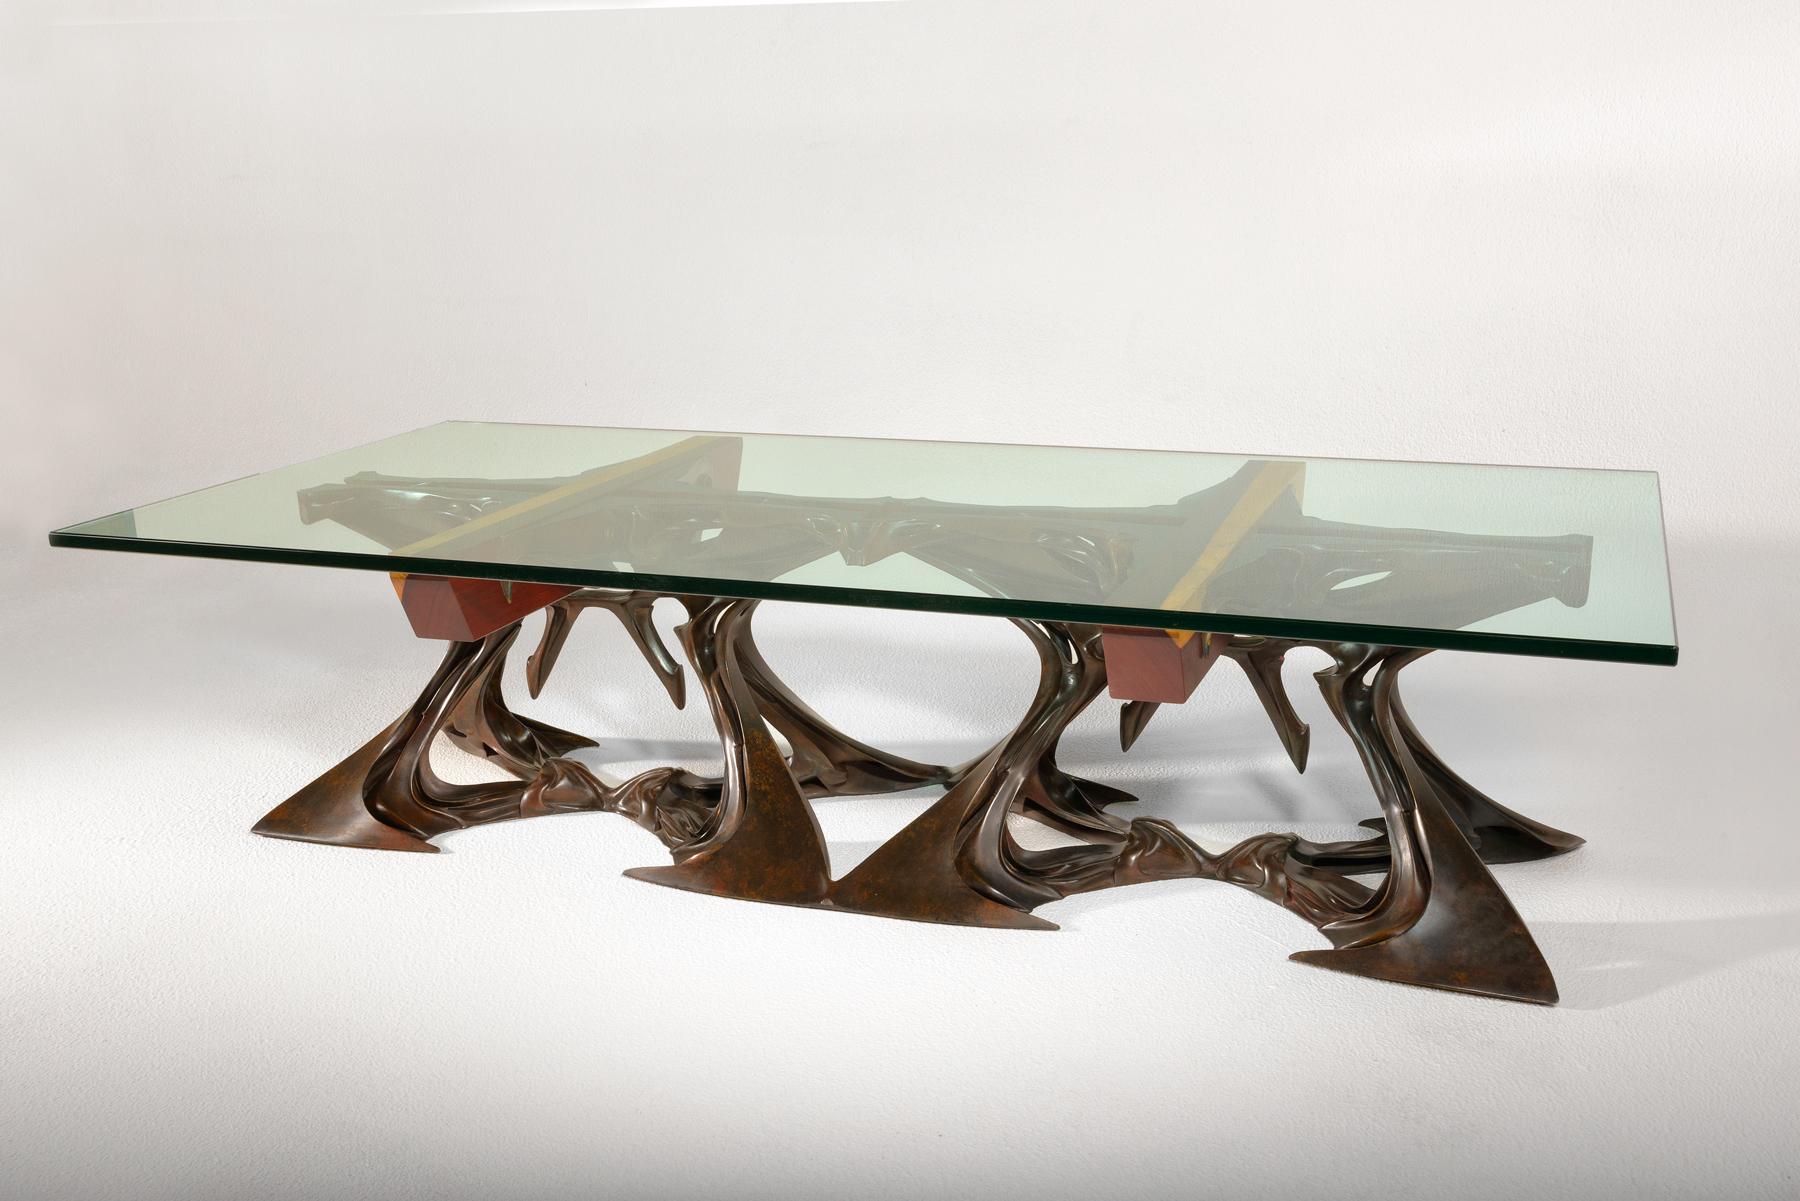 Vatskatabel    by Lawrence Welker IV   69″l x 32″w x 17″h   bronze, glass, bloodwood